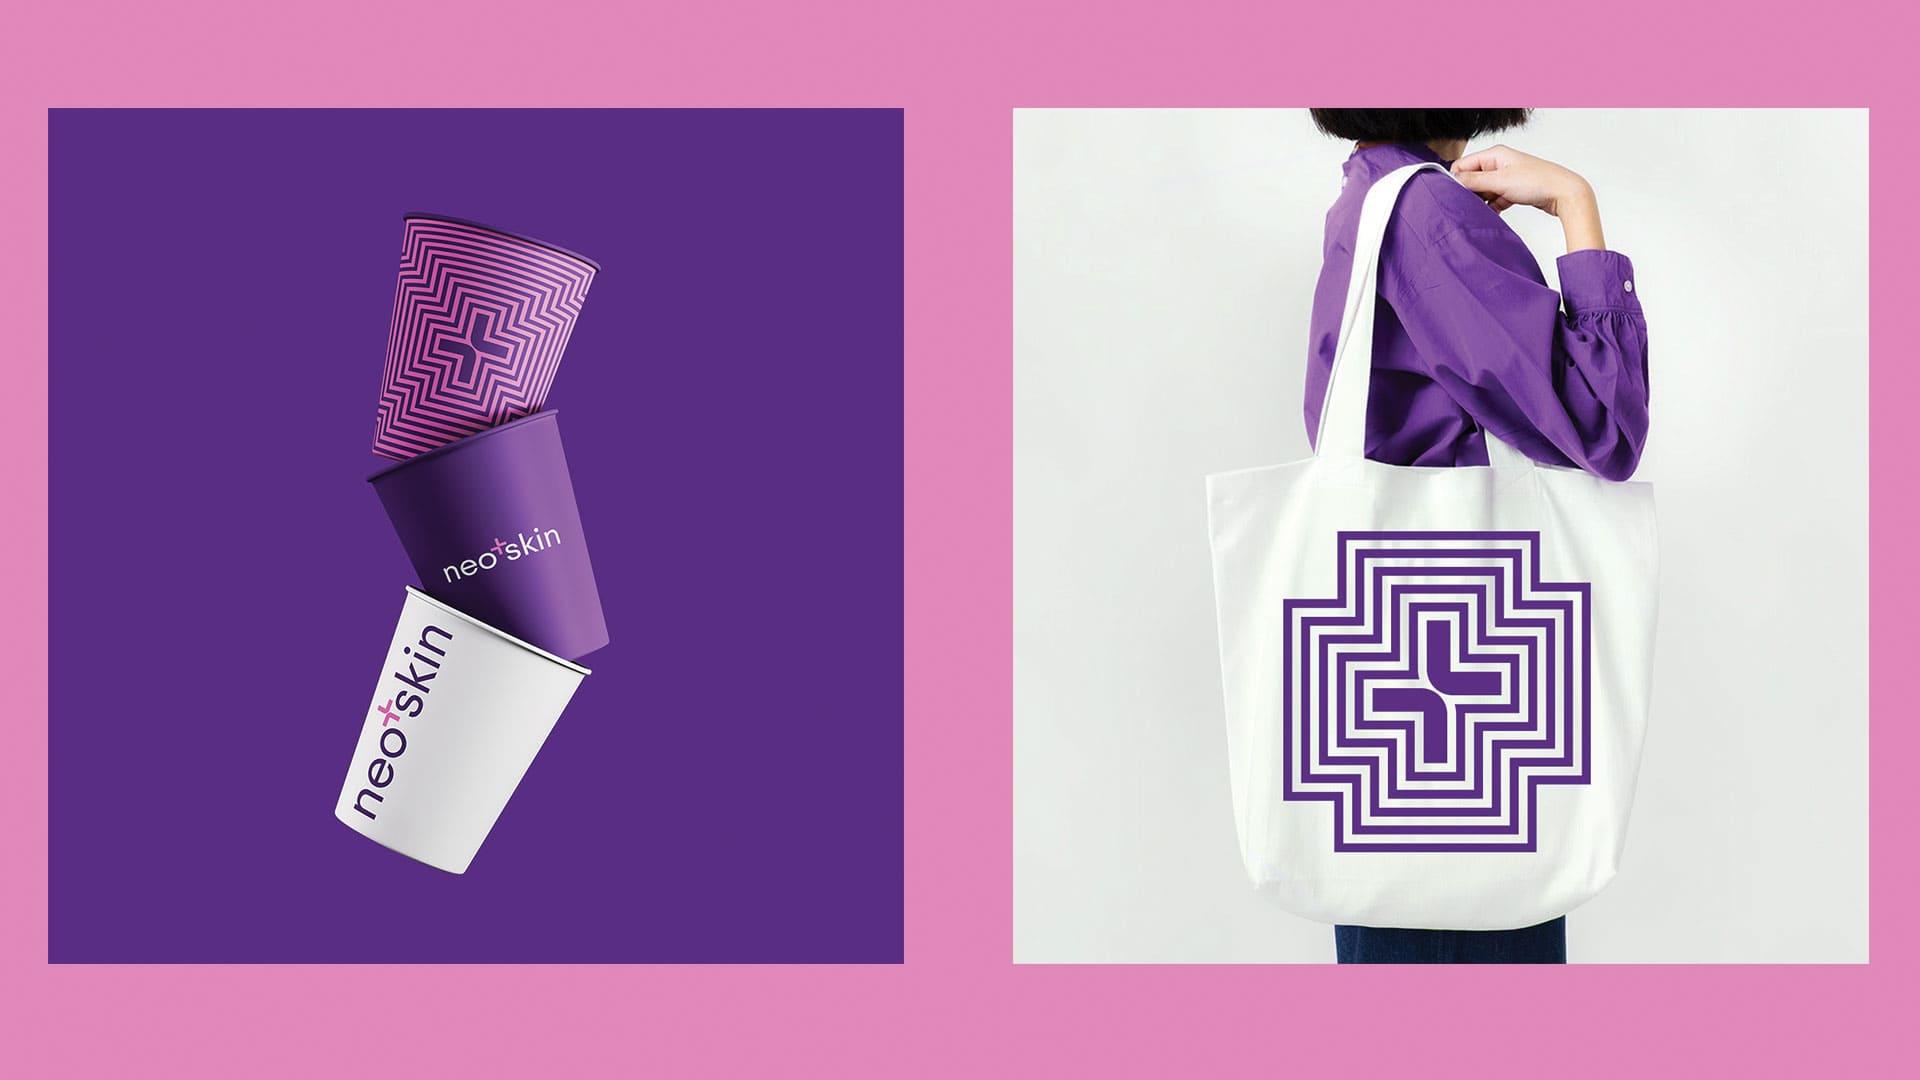 gra brand design neo skin 8